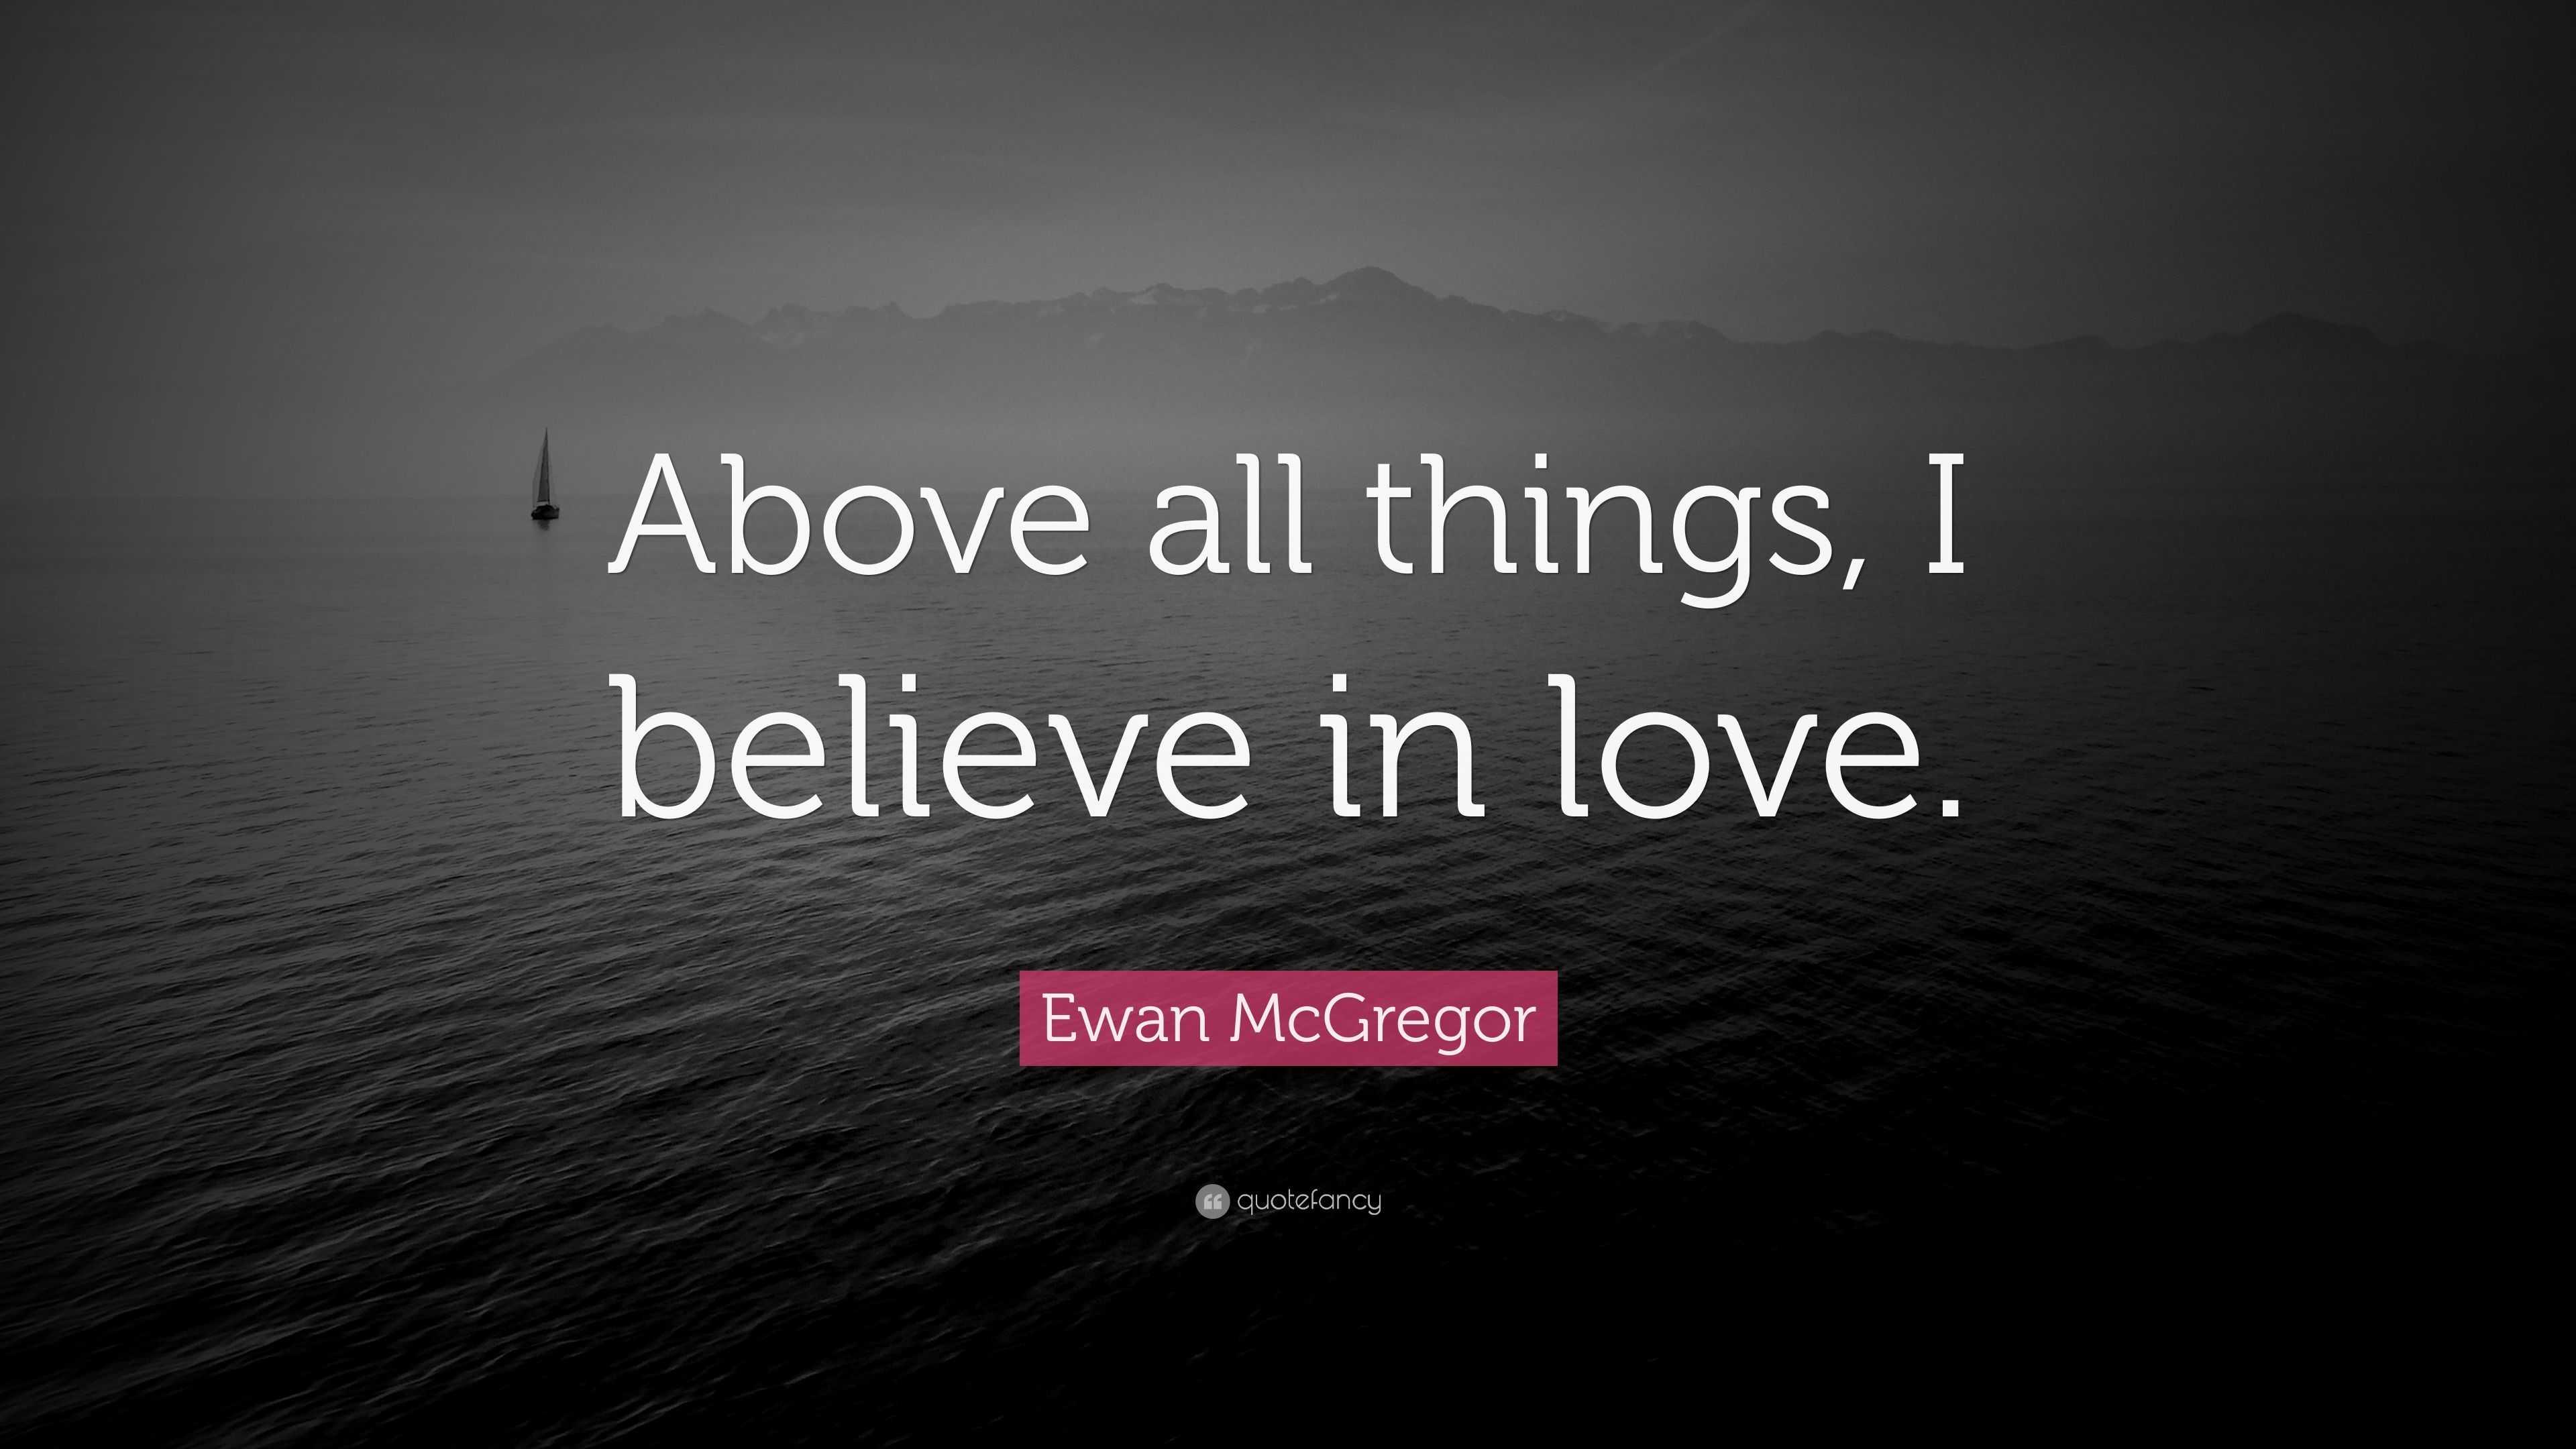 Ewan McGregor Quote: U201cAbove All Things, I Believe In Love.u201d